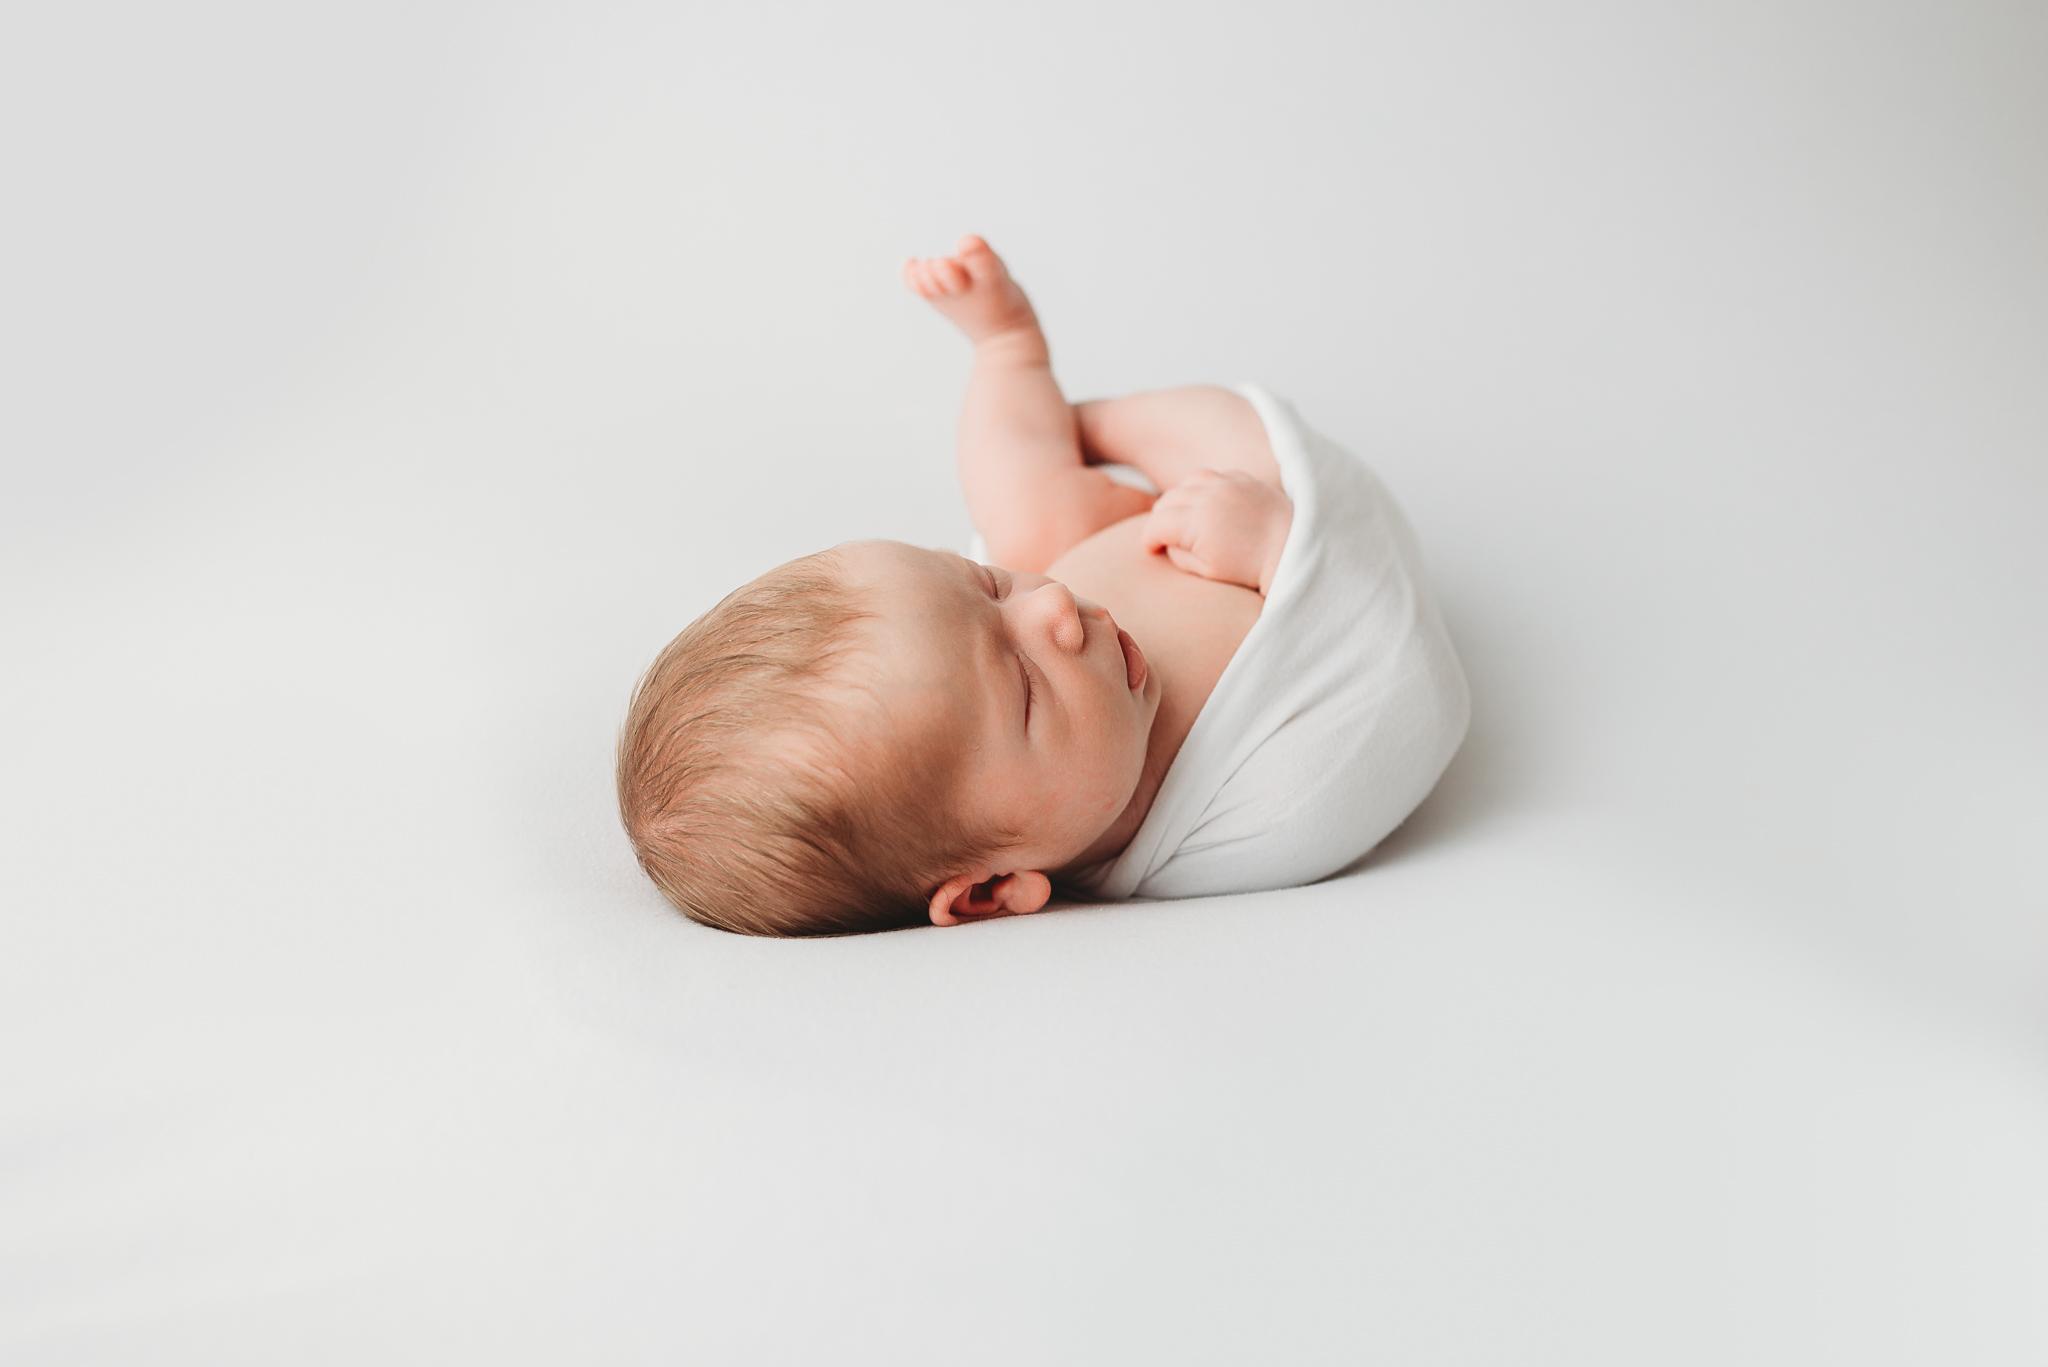 kelowna_newborn_photographer_lifestyle (2 of 1)-2.jpg